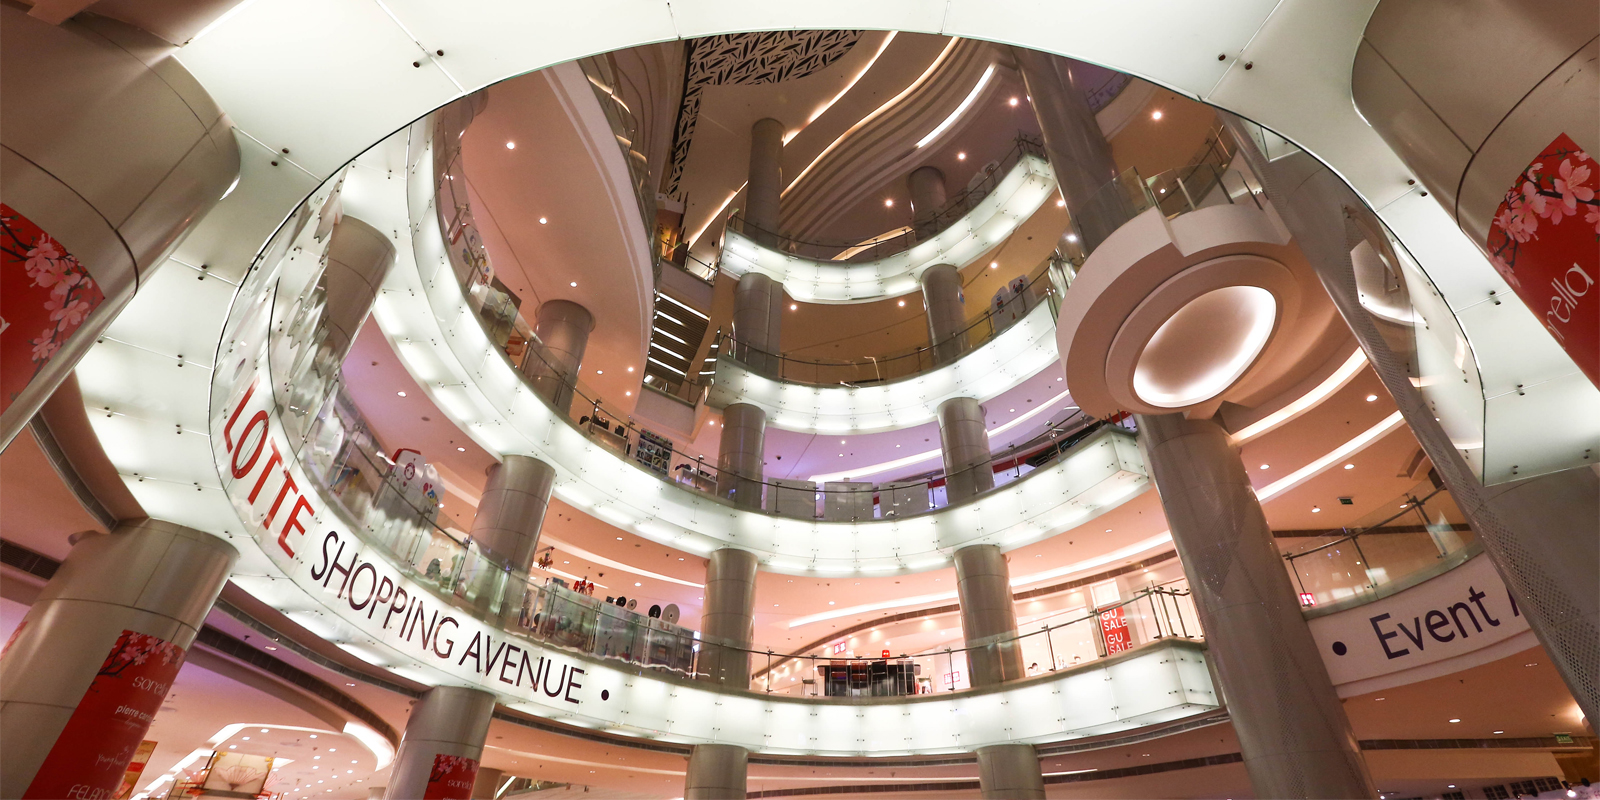 Lotte shopping avenue ciputra world jakarta 1 ciputra world jakarta gumiabroncs Images